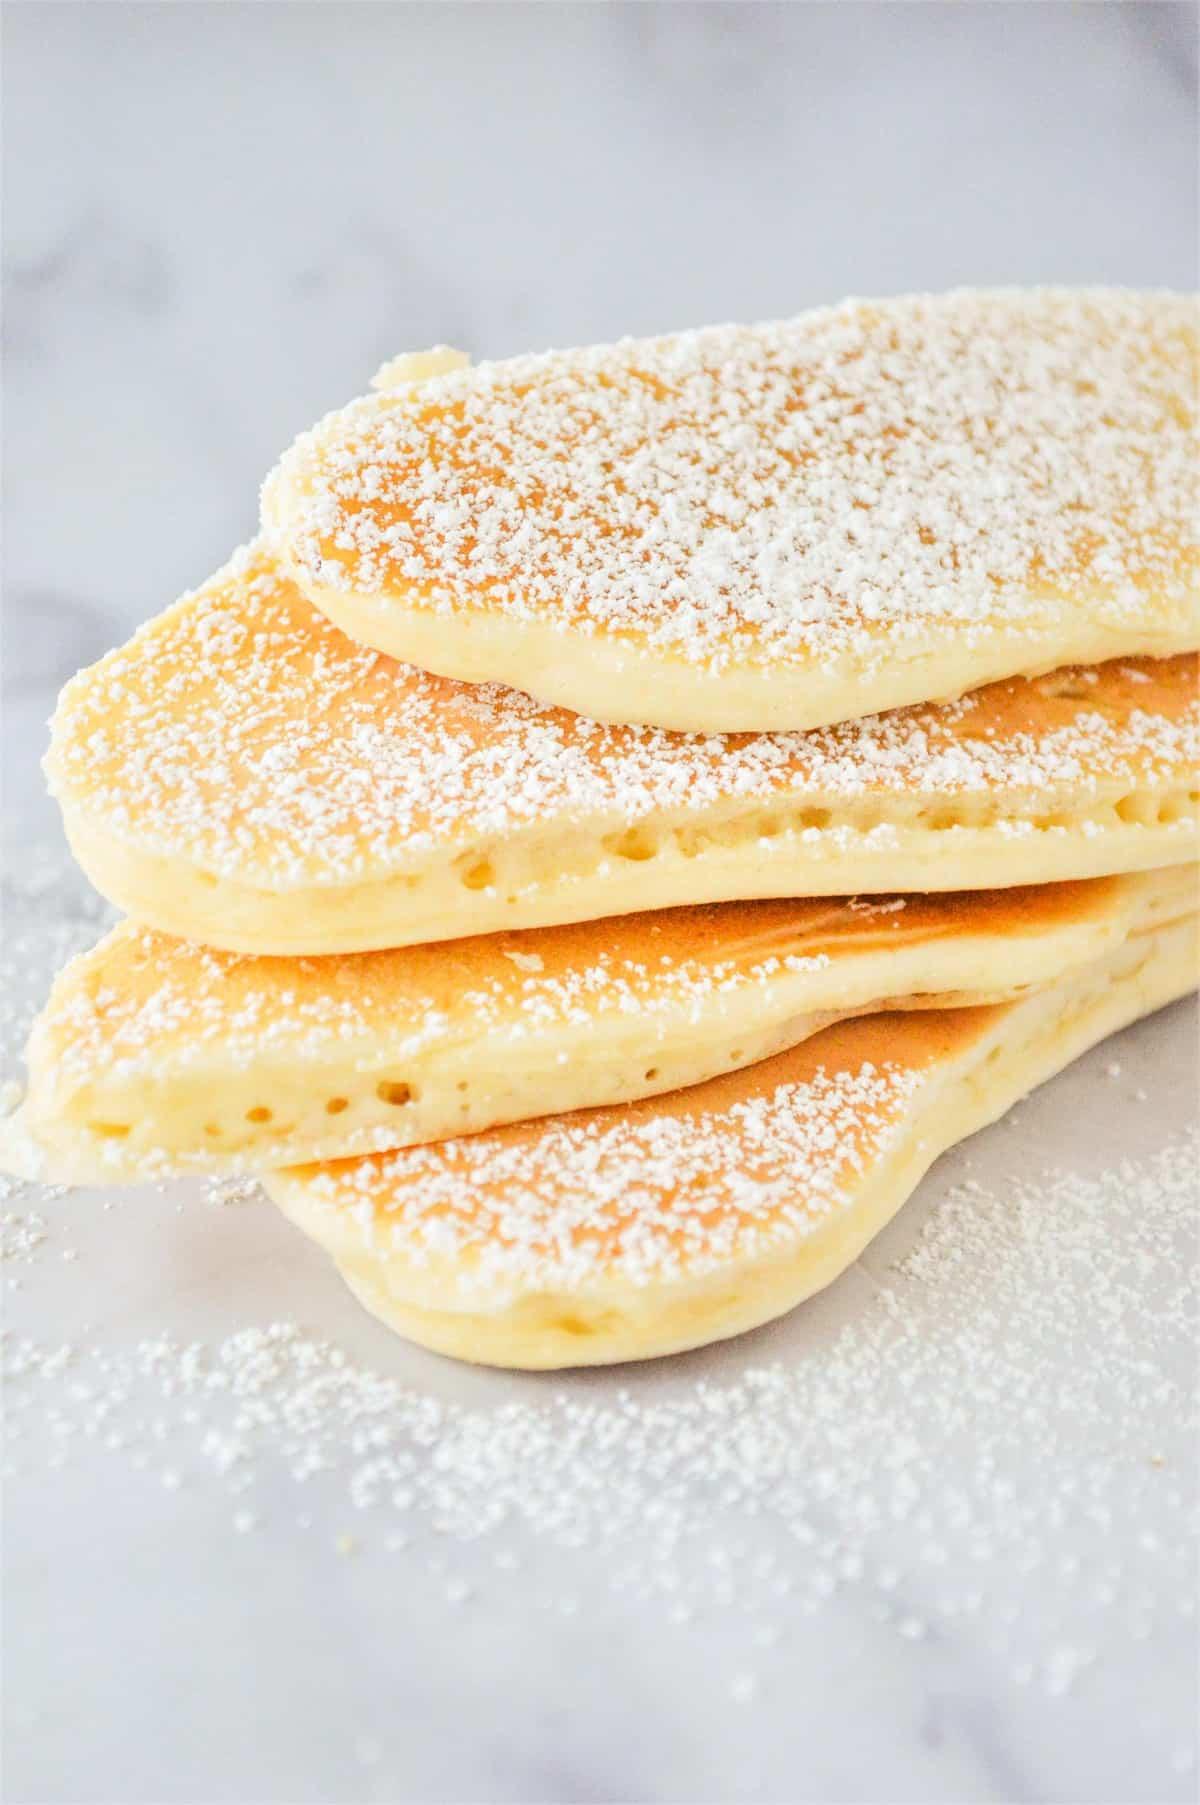 Stacked up long skinny pancakes.